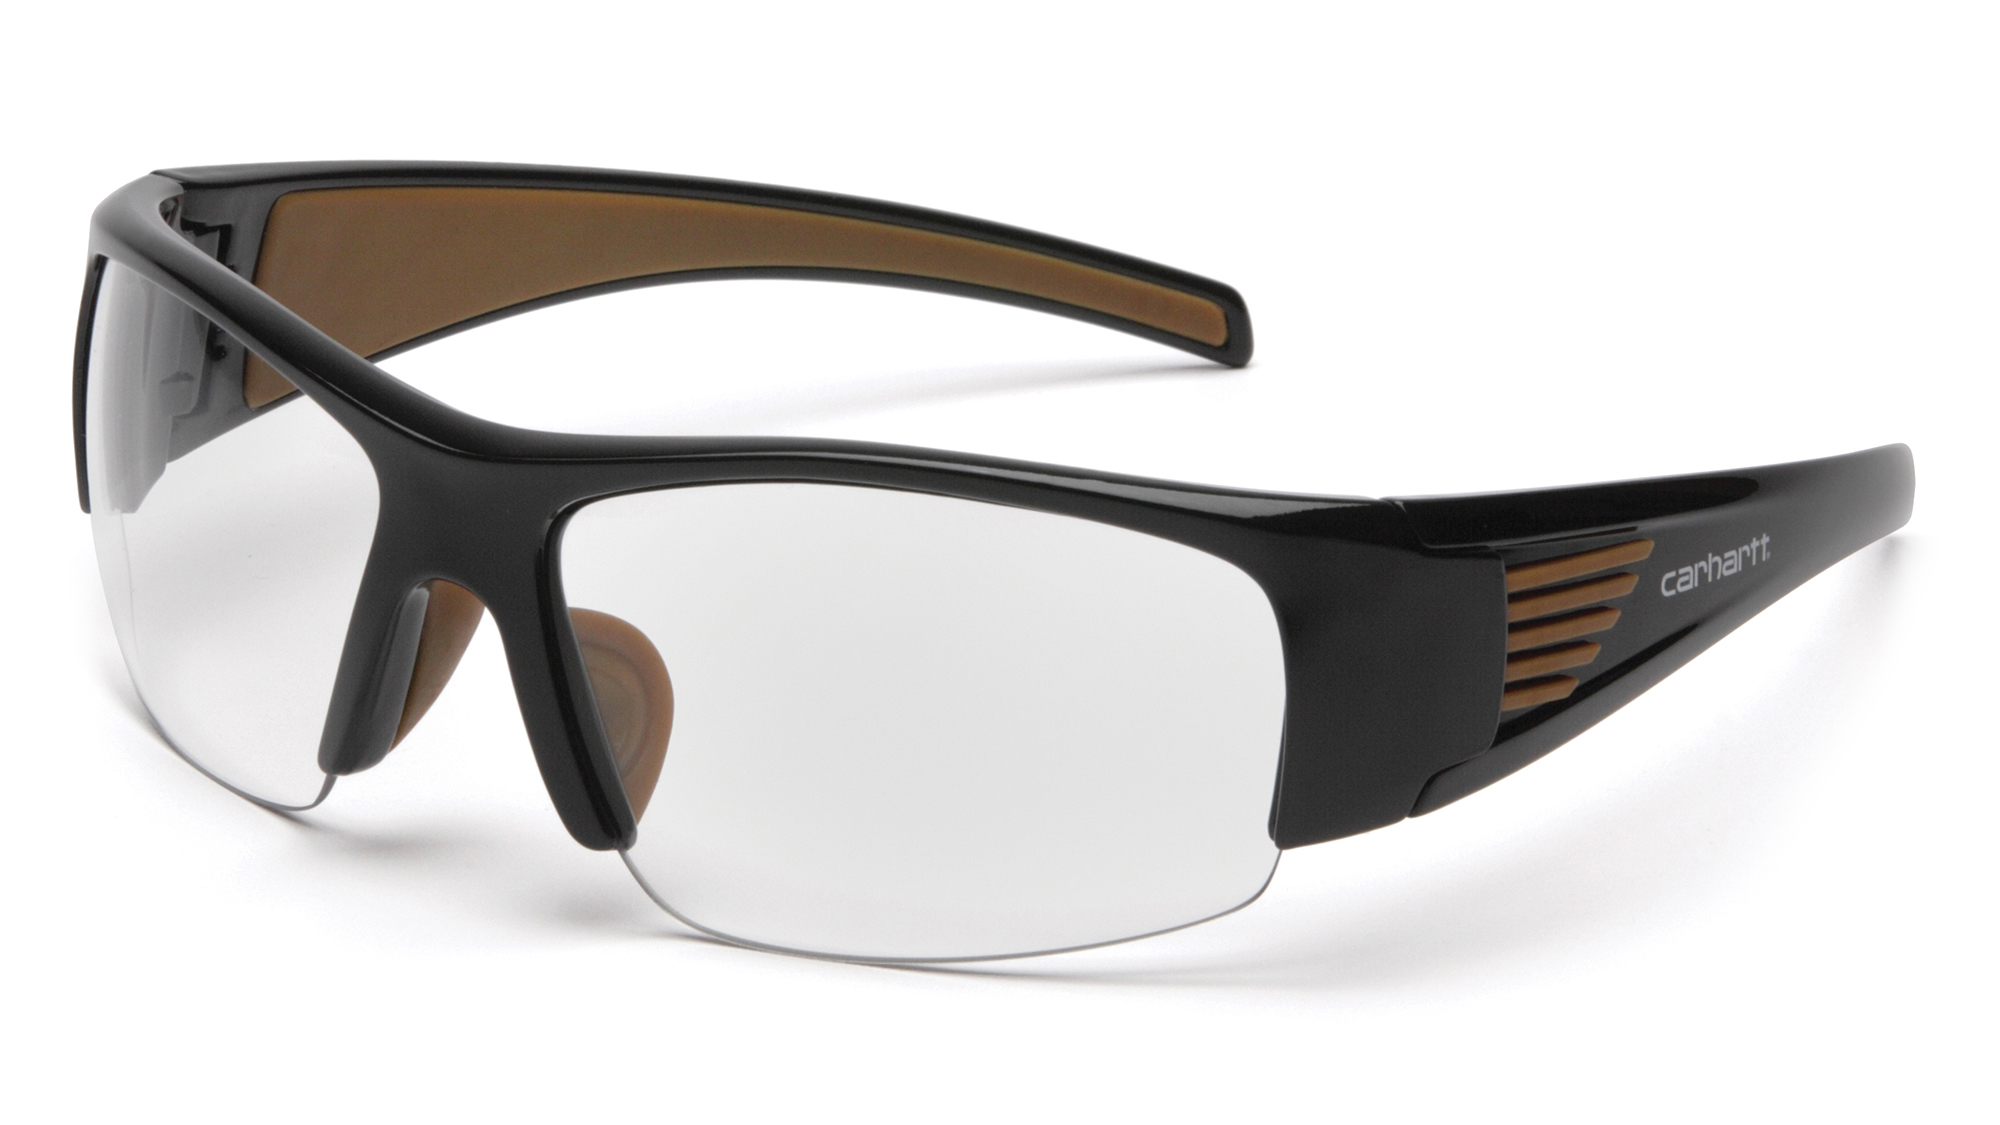 Carhartt Thunder Bay Clear Anti-Fog Lens Safety Glasses -Safety Glasses